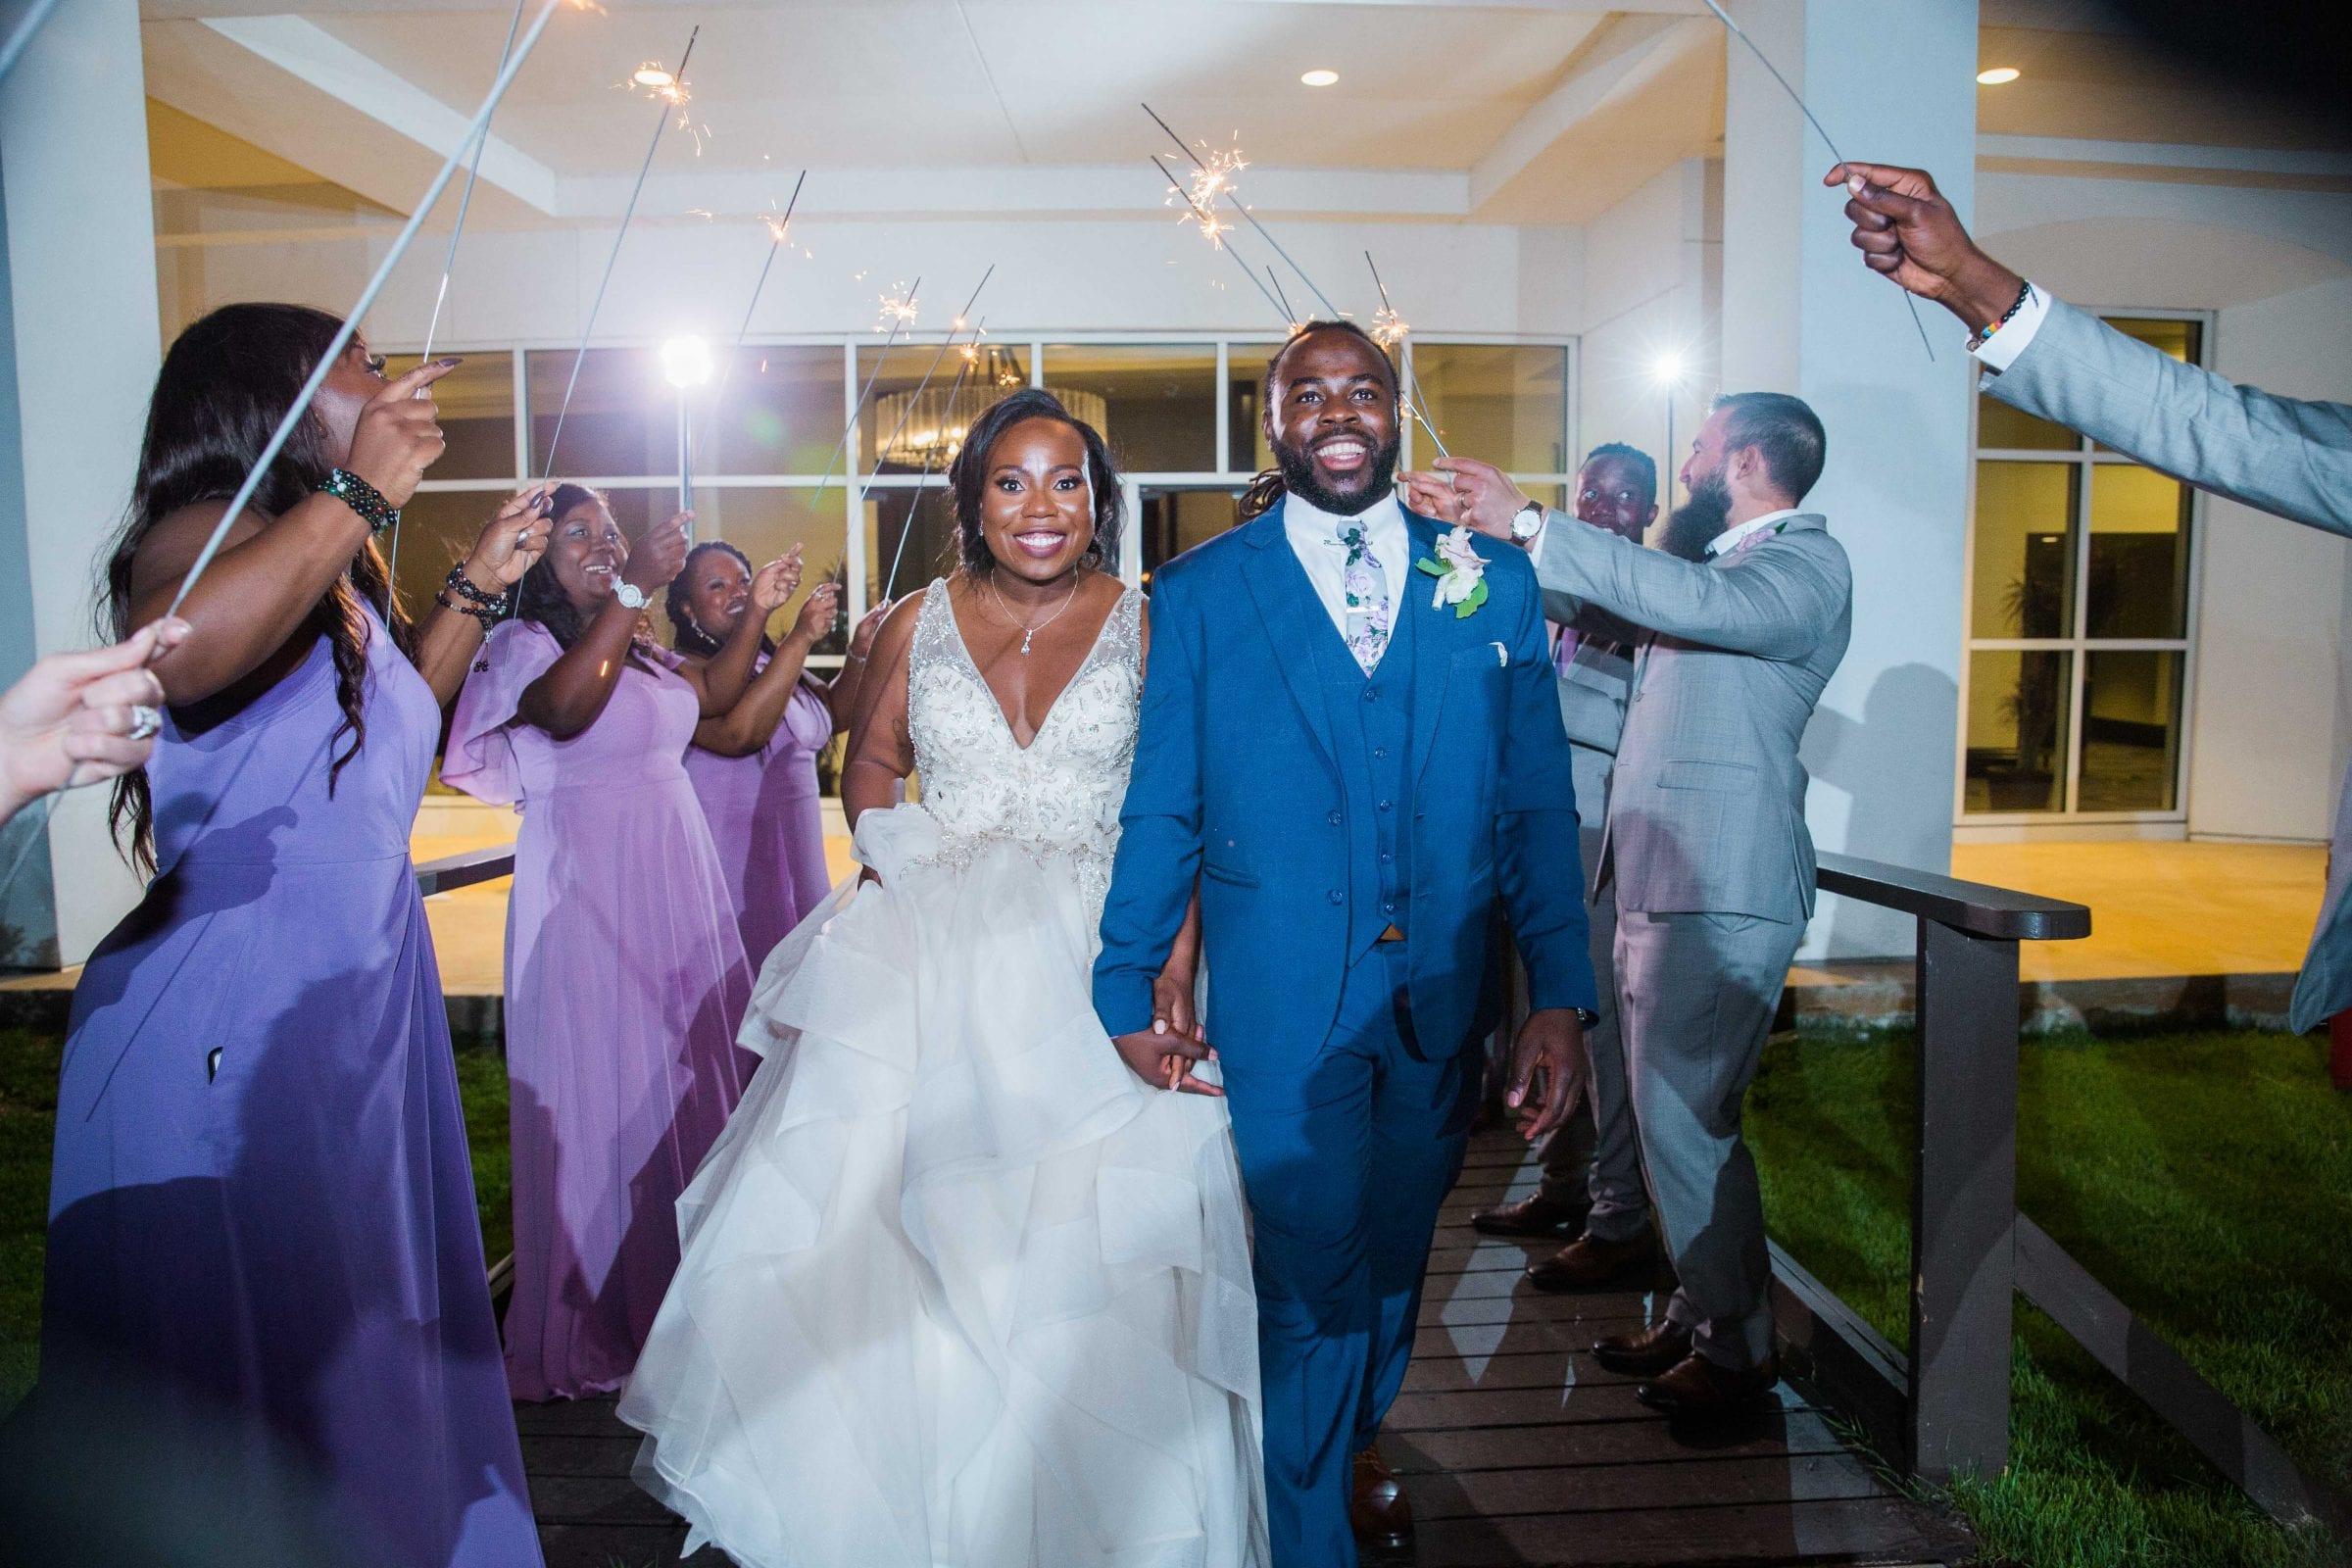 Onyema wedding La Cantera exit with sparklers